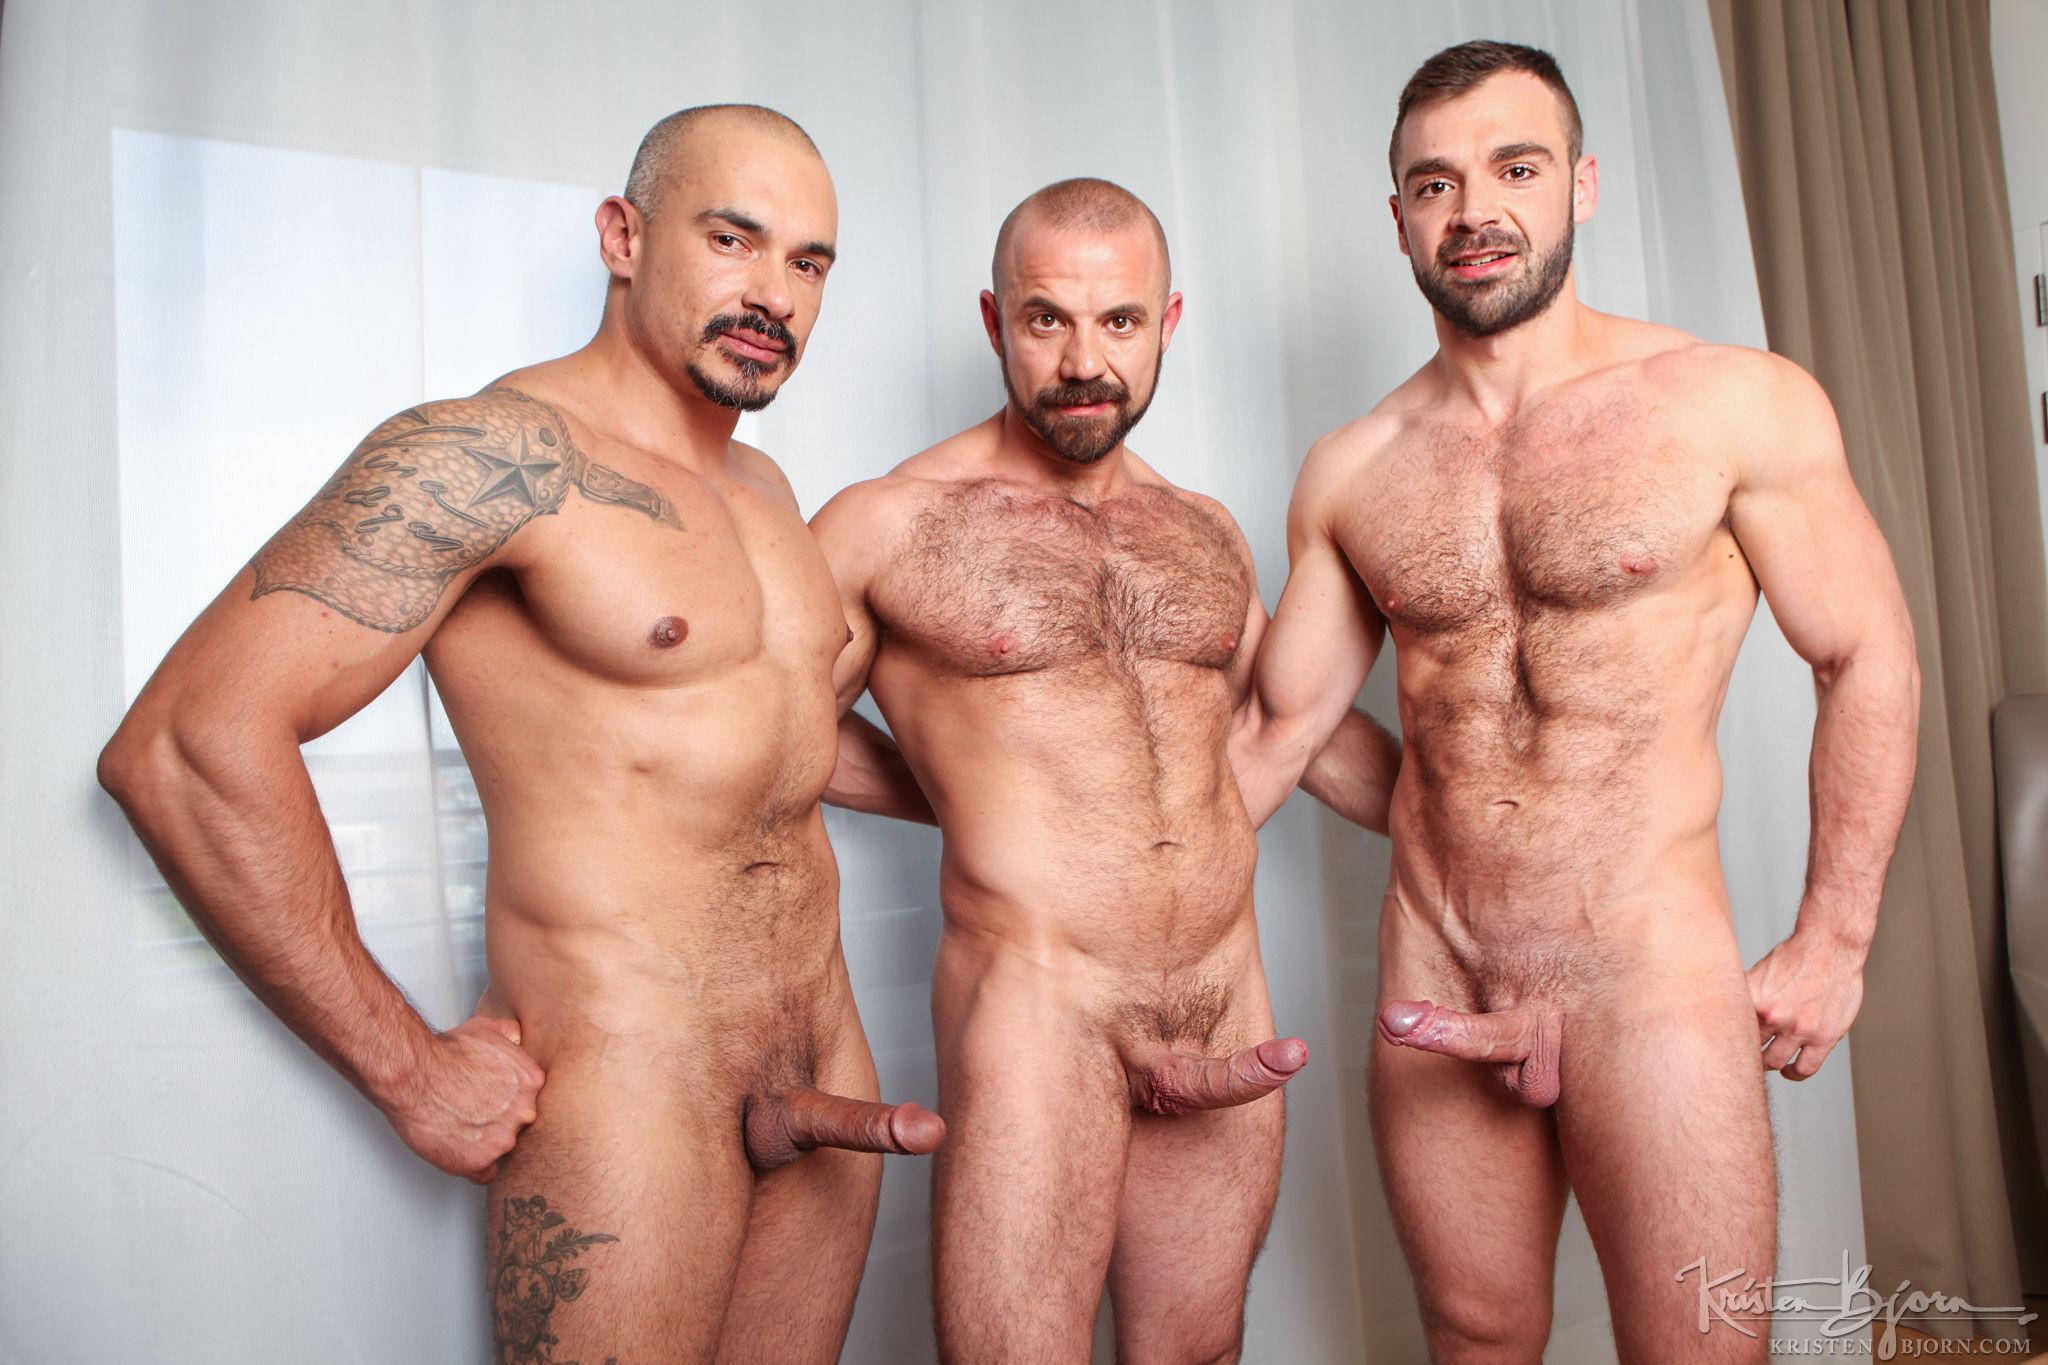 Skins: Room With A View – Felipe Ferro, Jose Quevedo, Santi Noguera